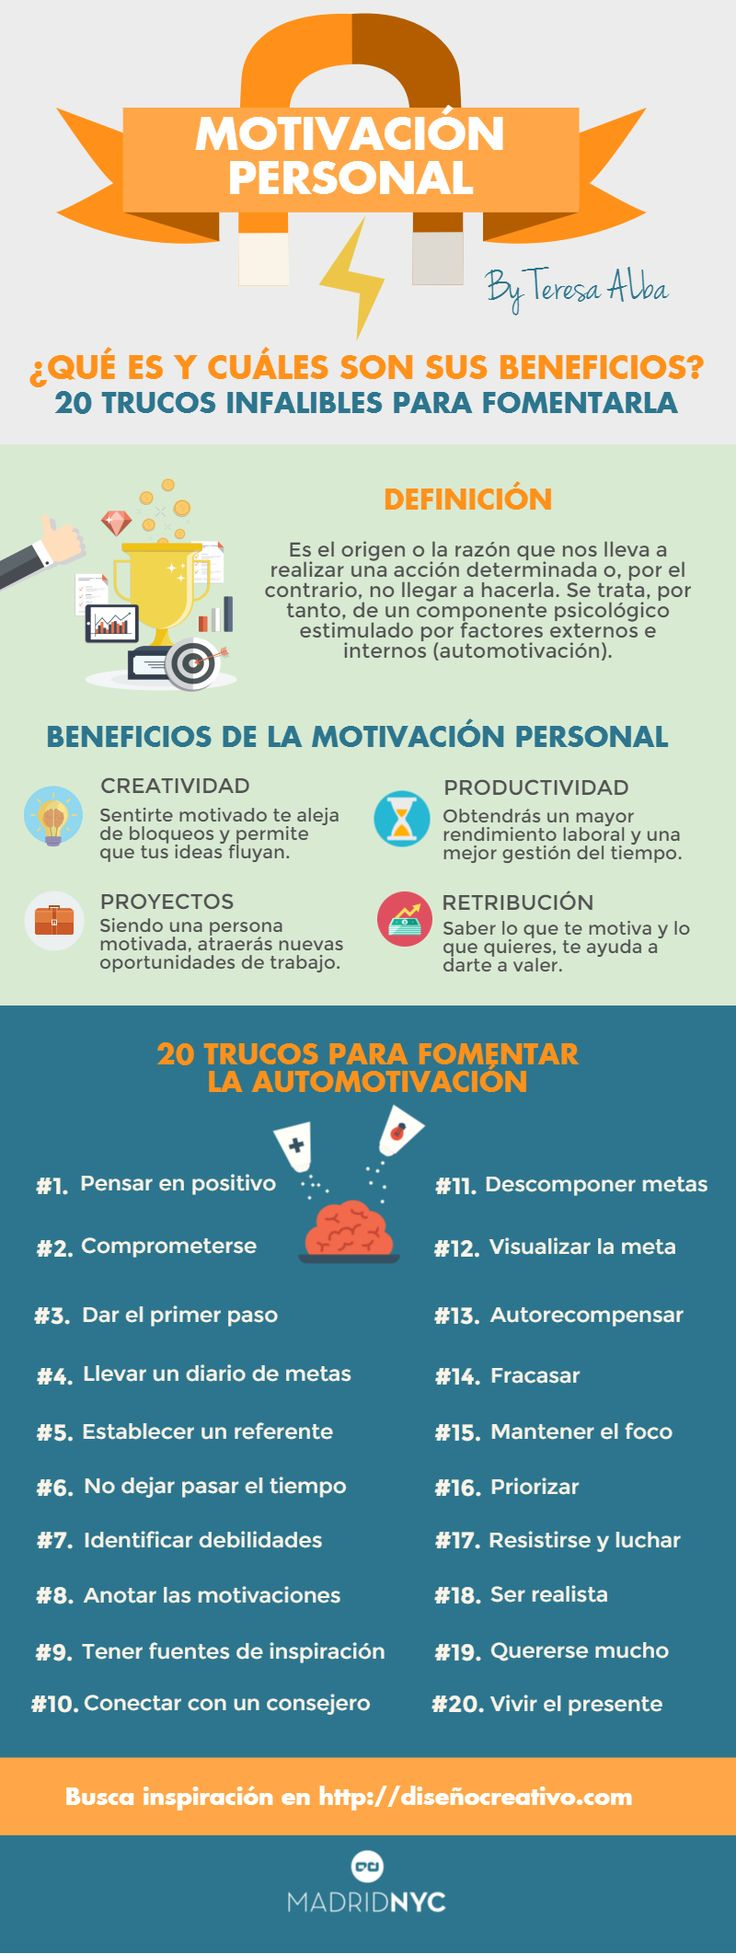 motivacion-personal-infografia-Teresa-Alba-MadridNYC